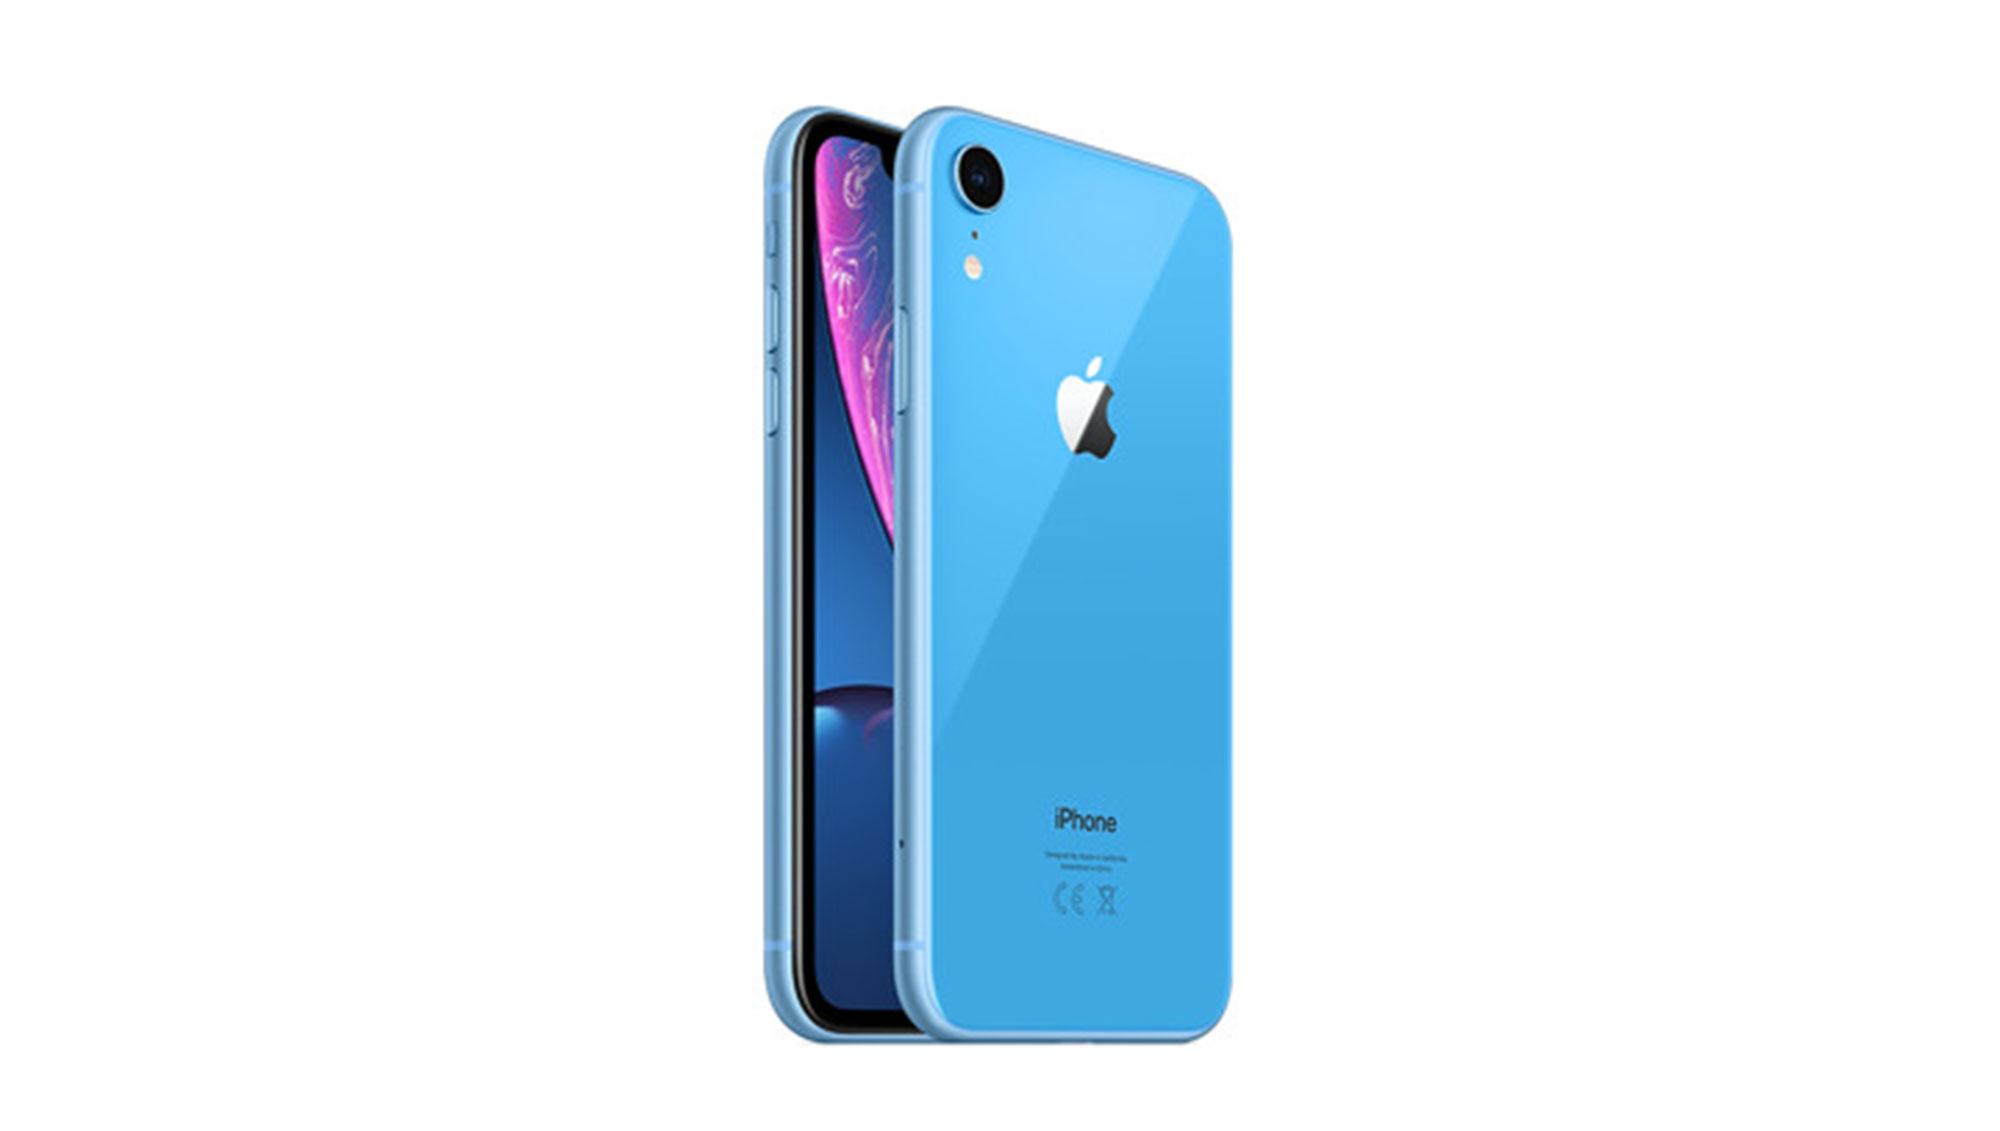 CIRP 调查显示:iPhone XR 成为上季度美国最畅销的苹果手机